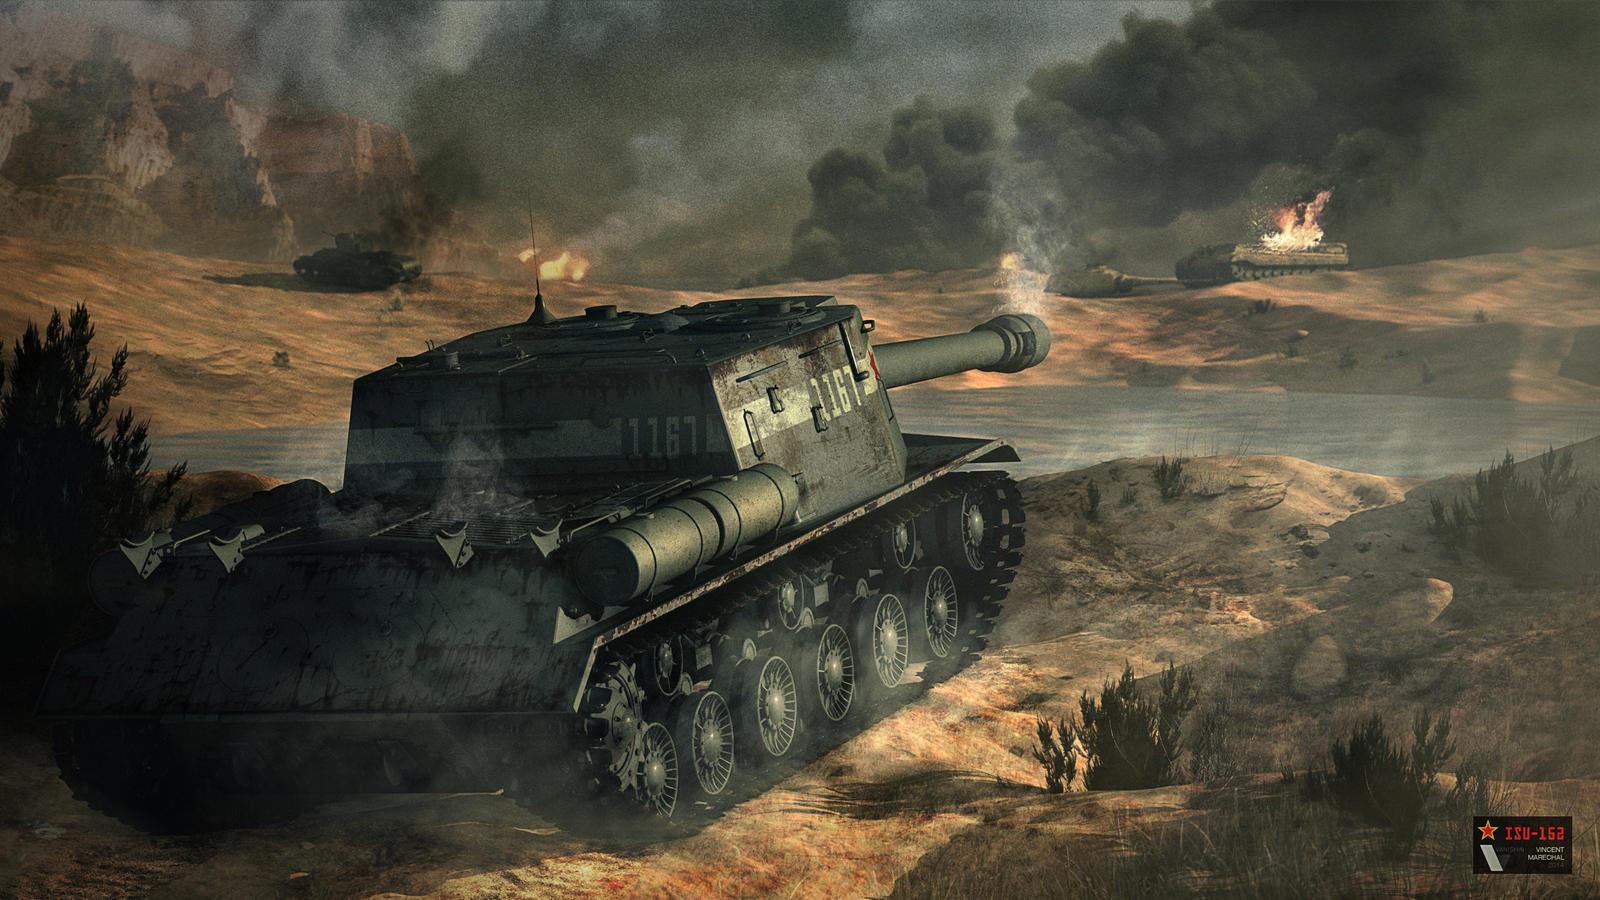 ISU-152 - Soviet tank destroyer by Vanishin